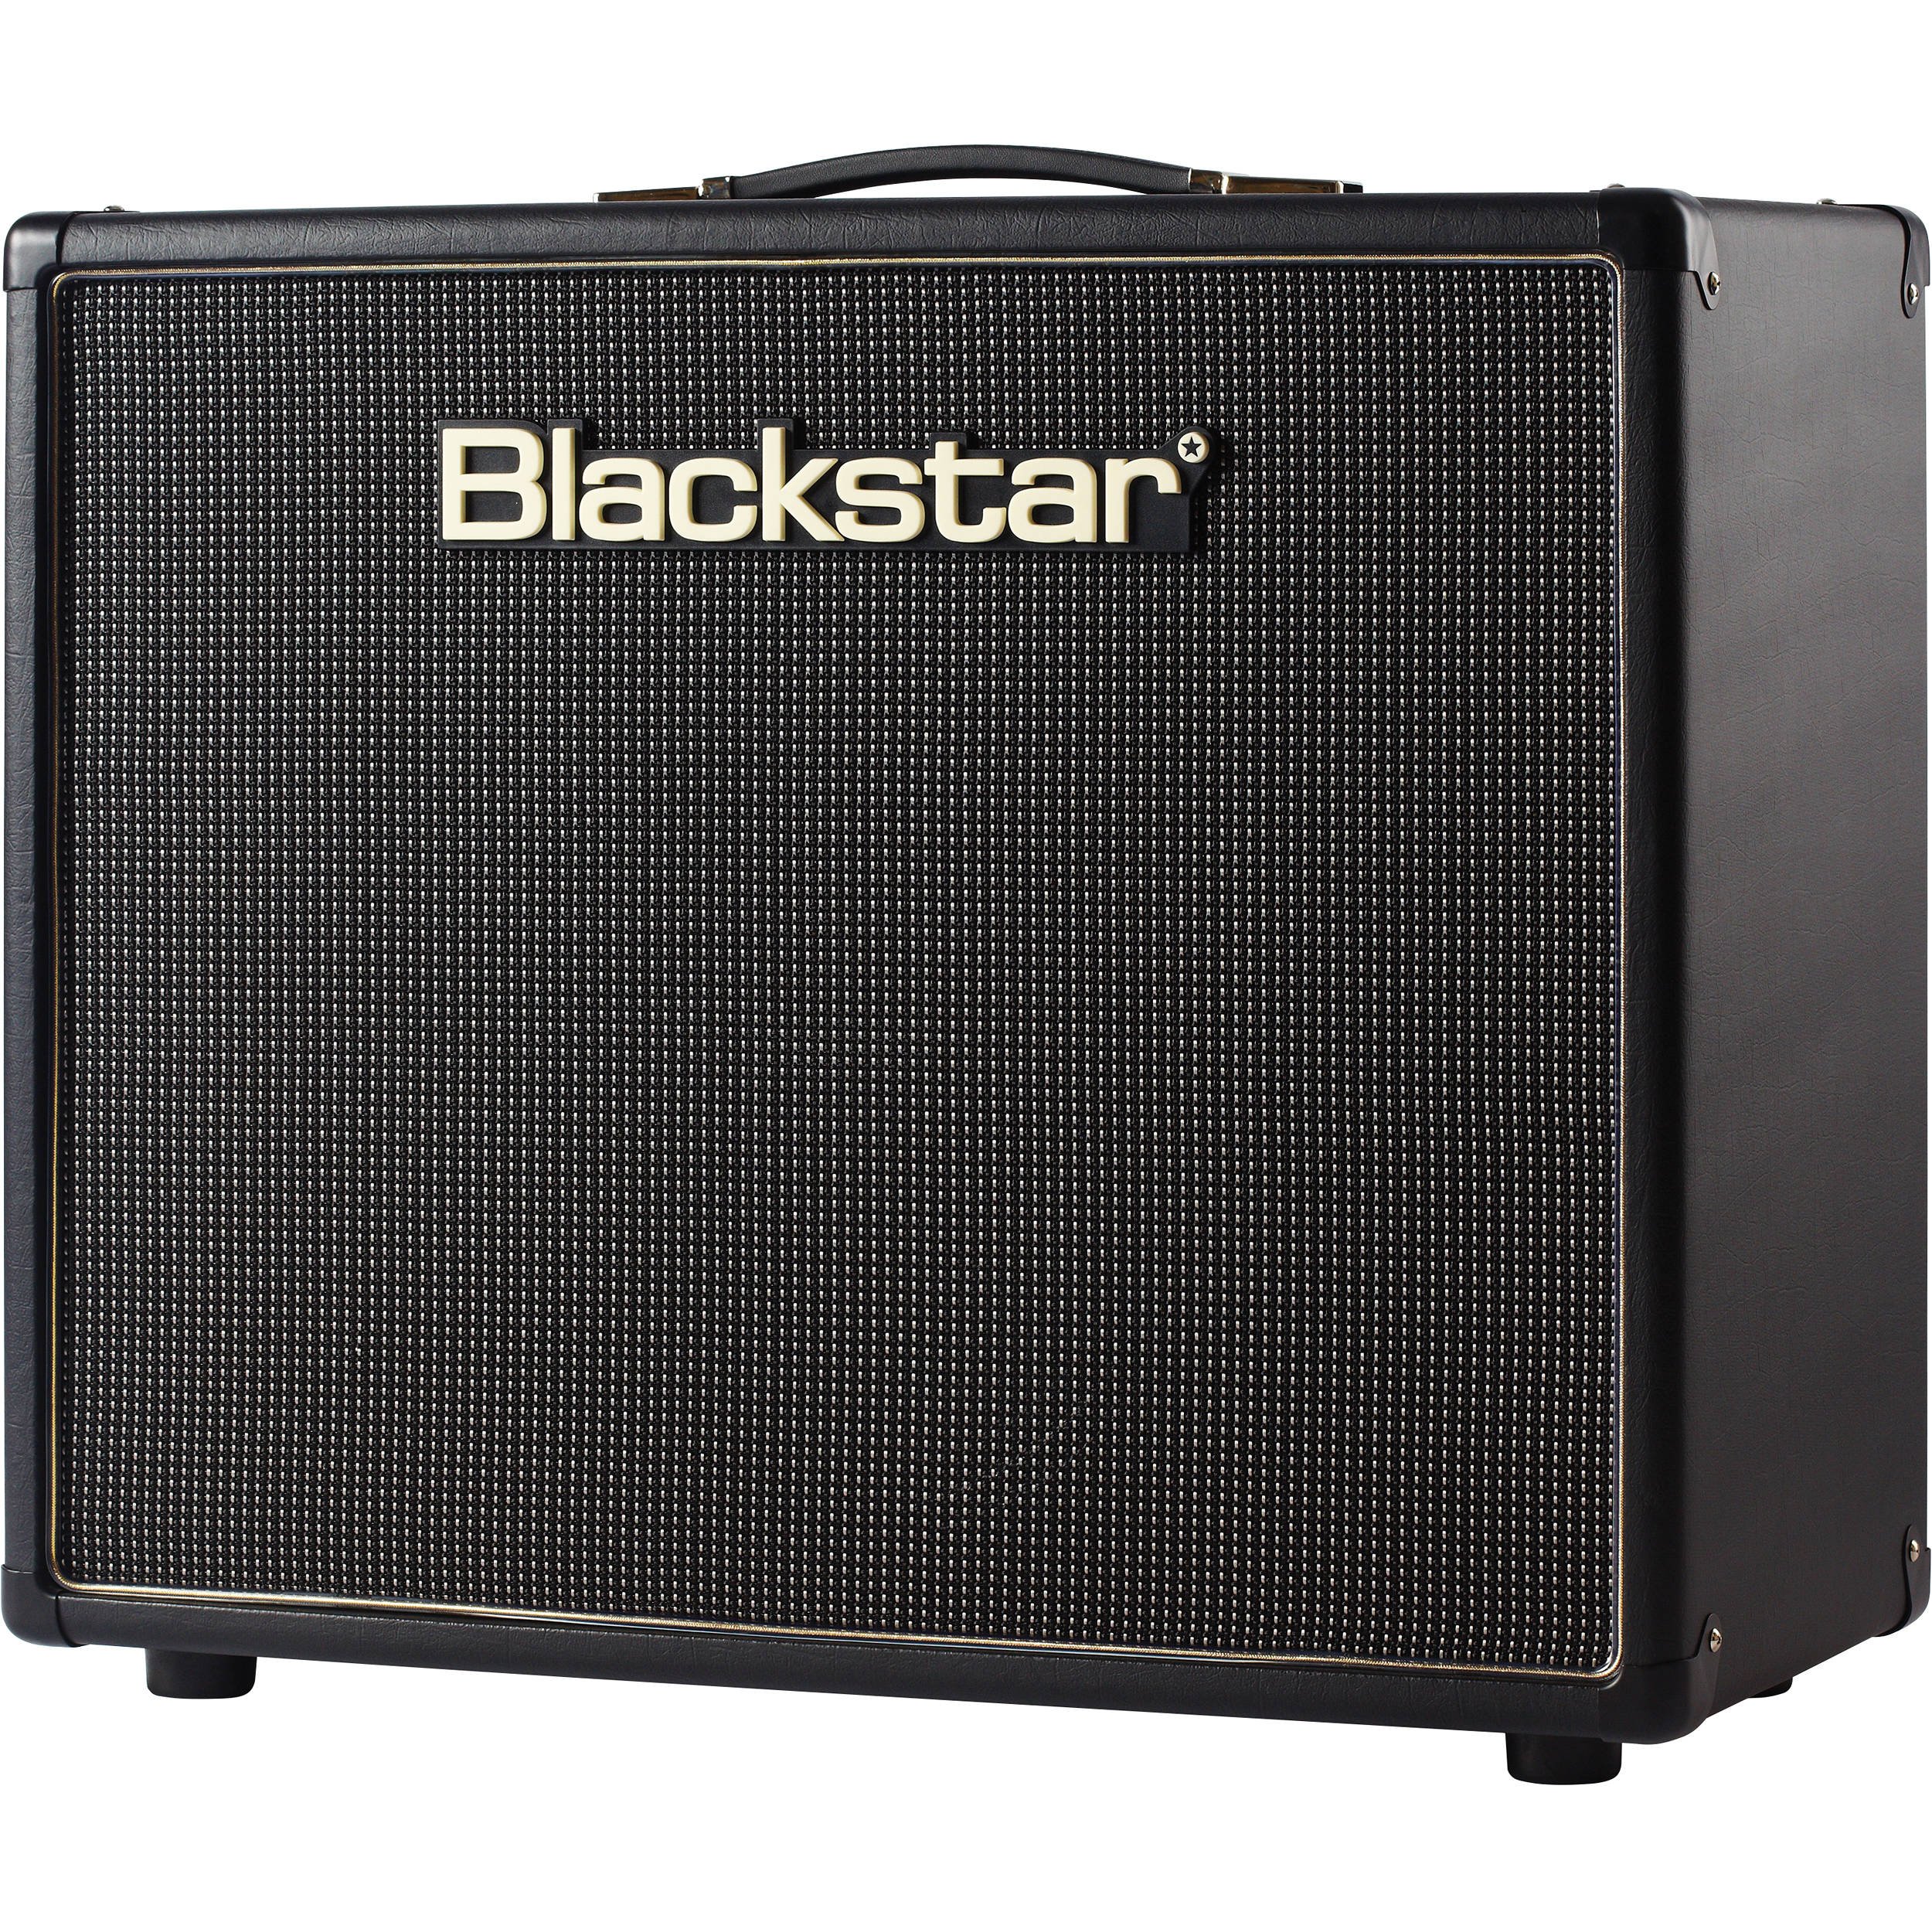 Blackstar 1x12 Cab : blackstar htv 112 1x12 guitar cabinet htv112 b h photo video ~ Vivirlamusica.com Haus und Dekorationen